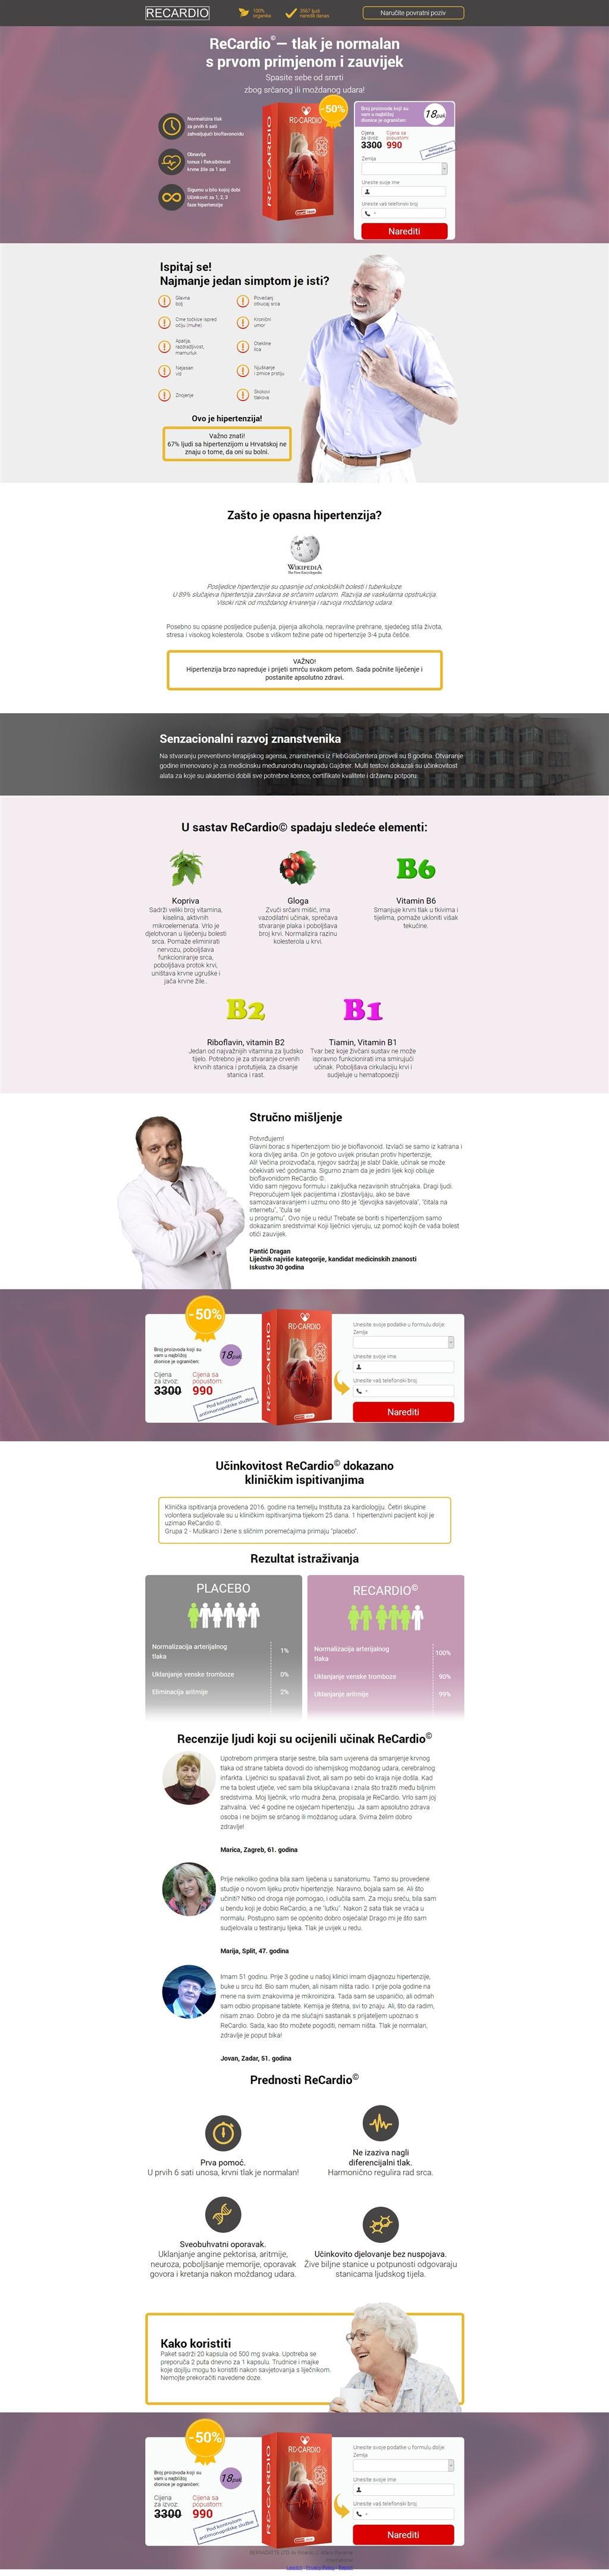 liječenje hipertenzije ricardo journal of hypertension